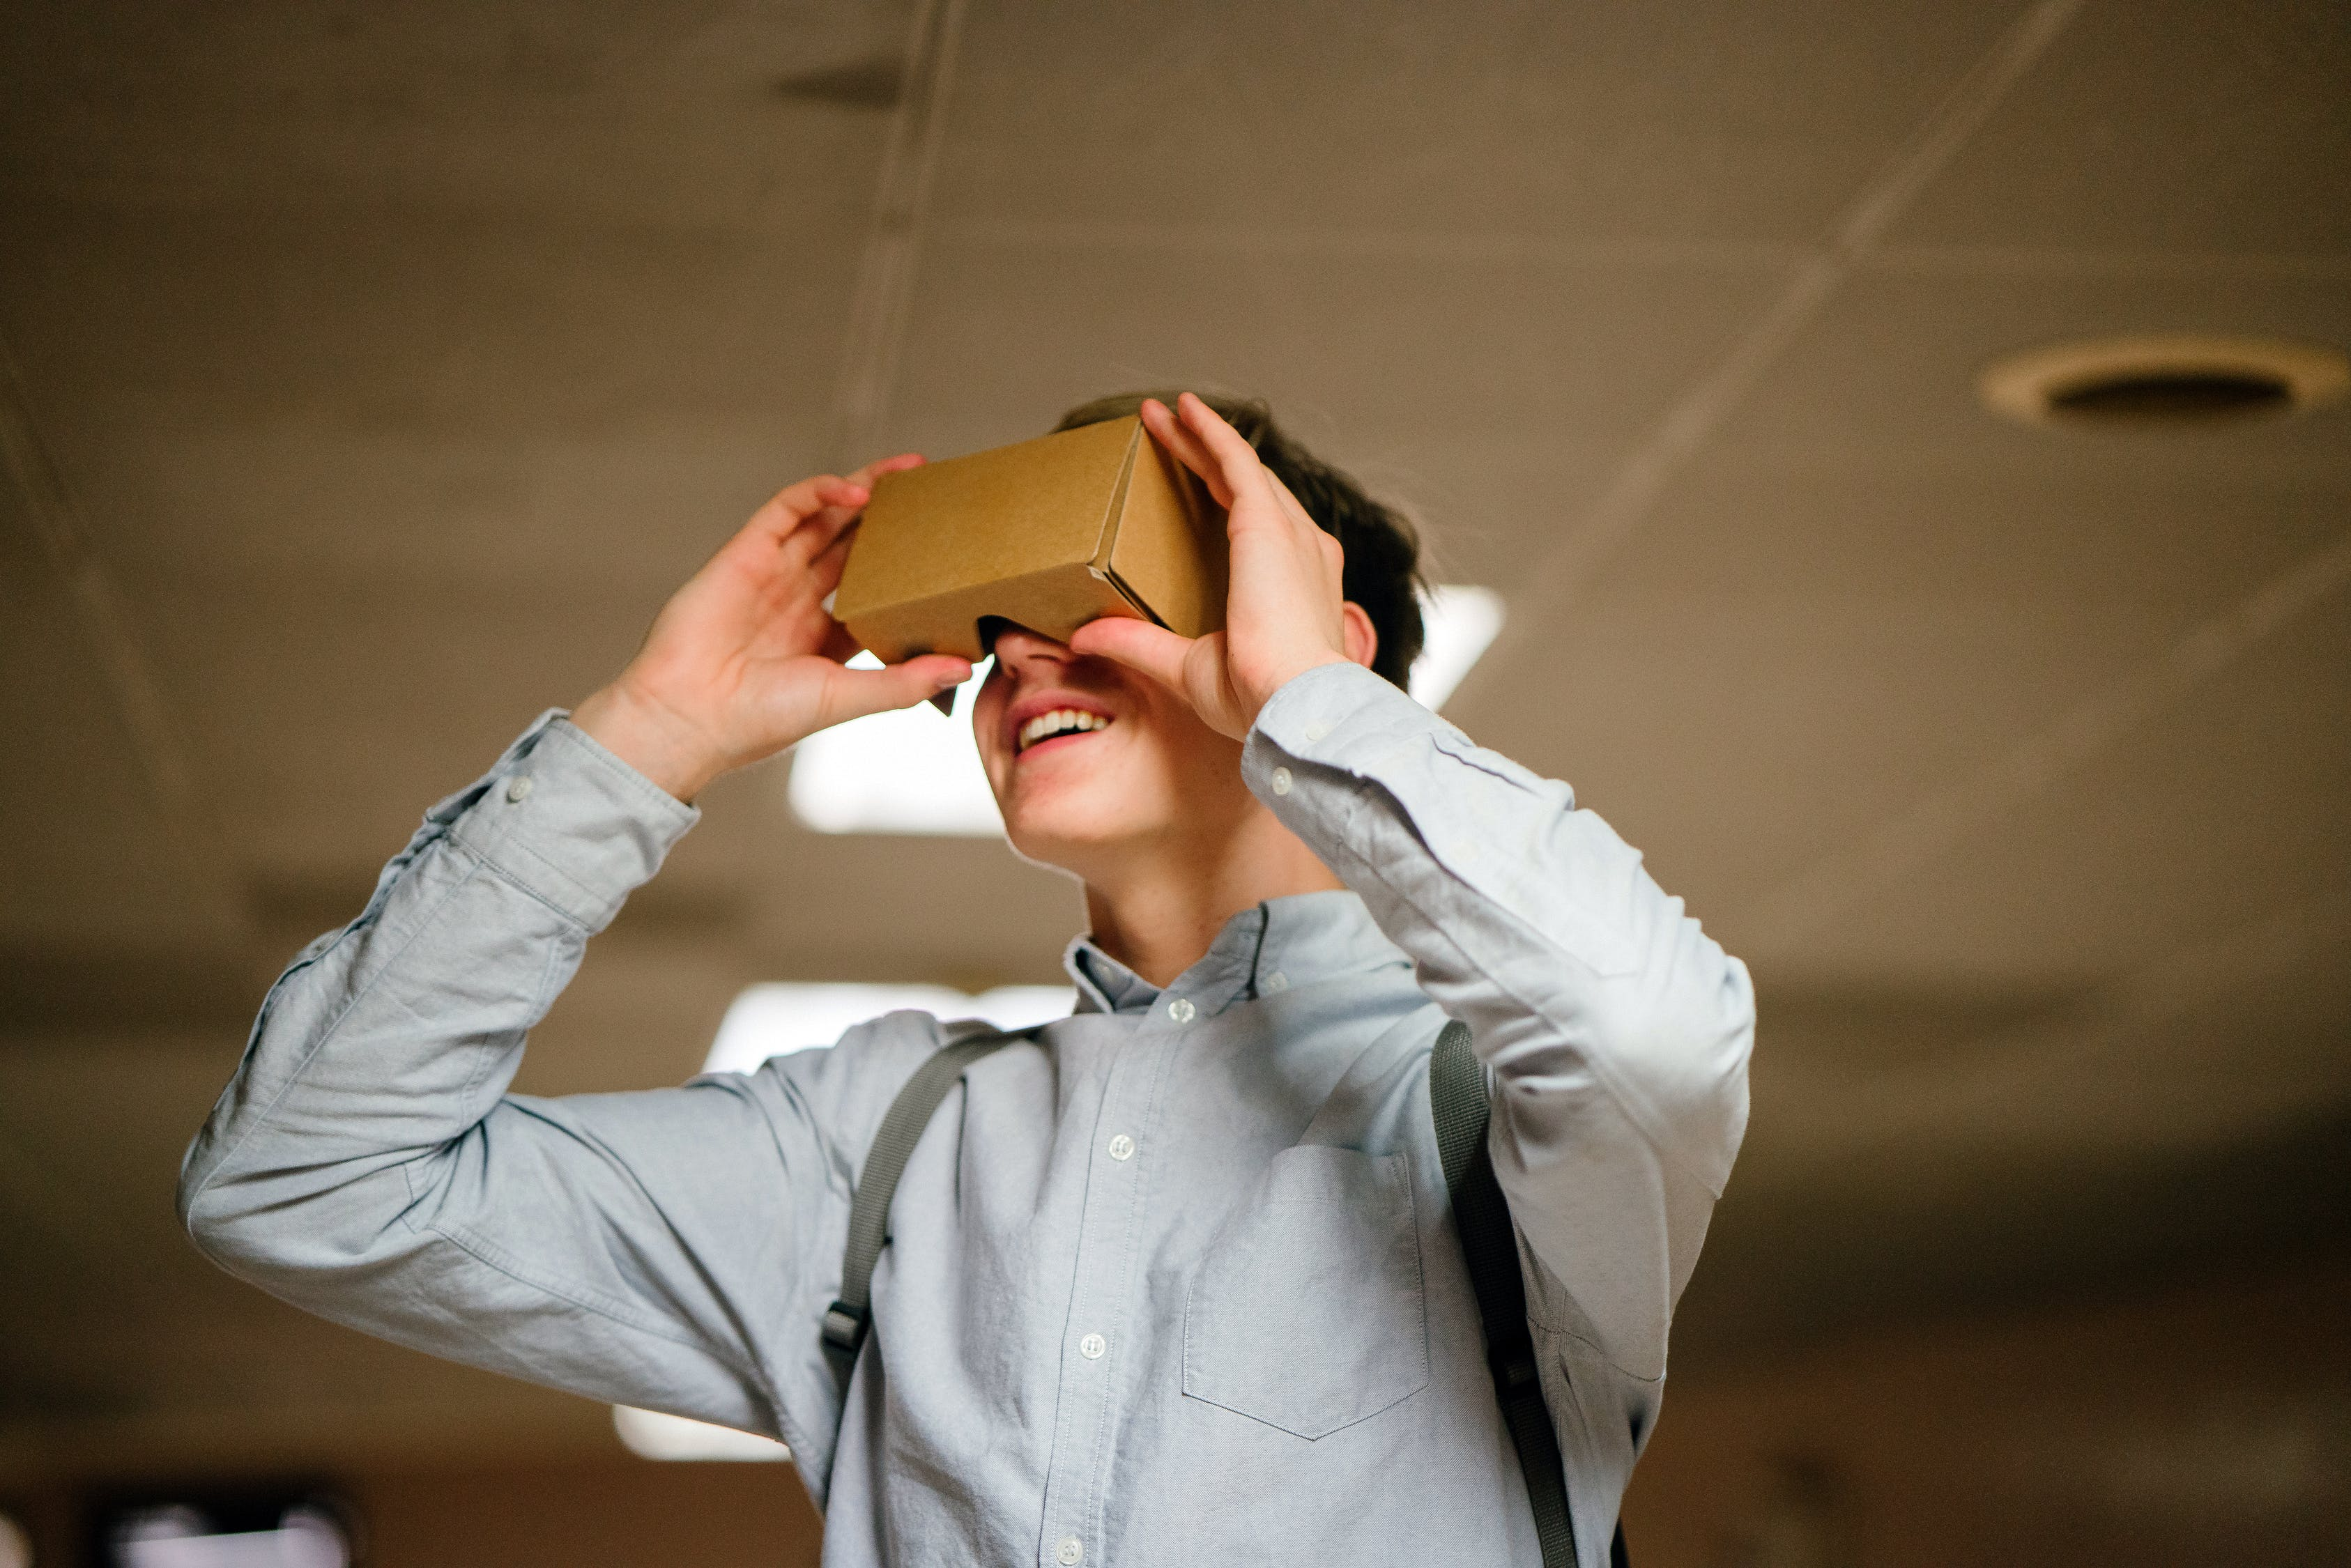 Retrospective XR : le Google Cardboard sortait en 2014